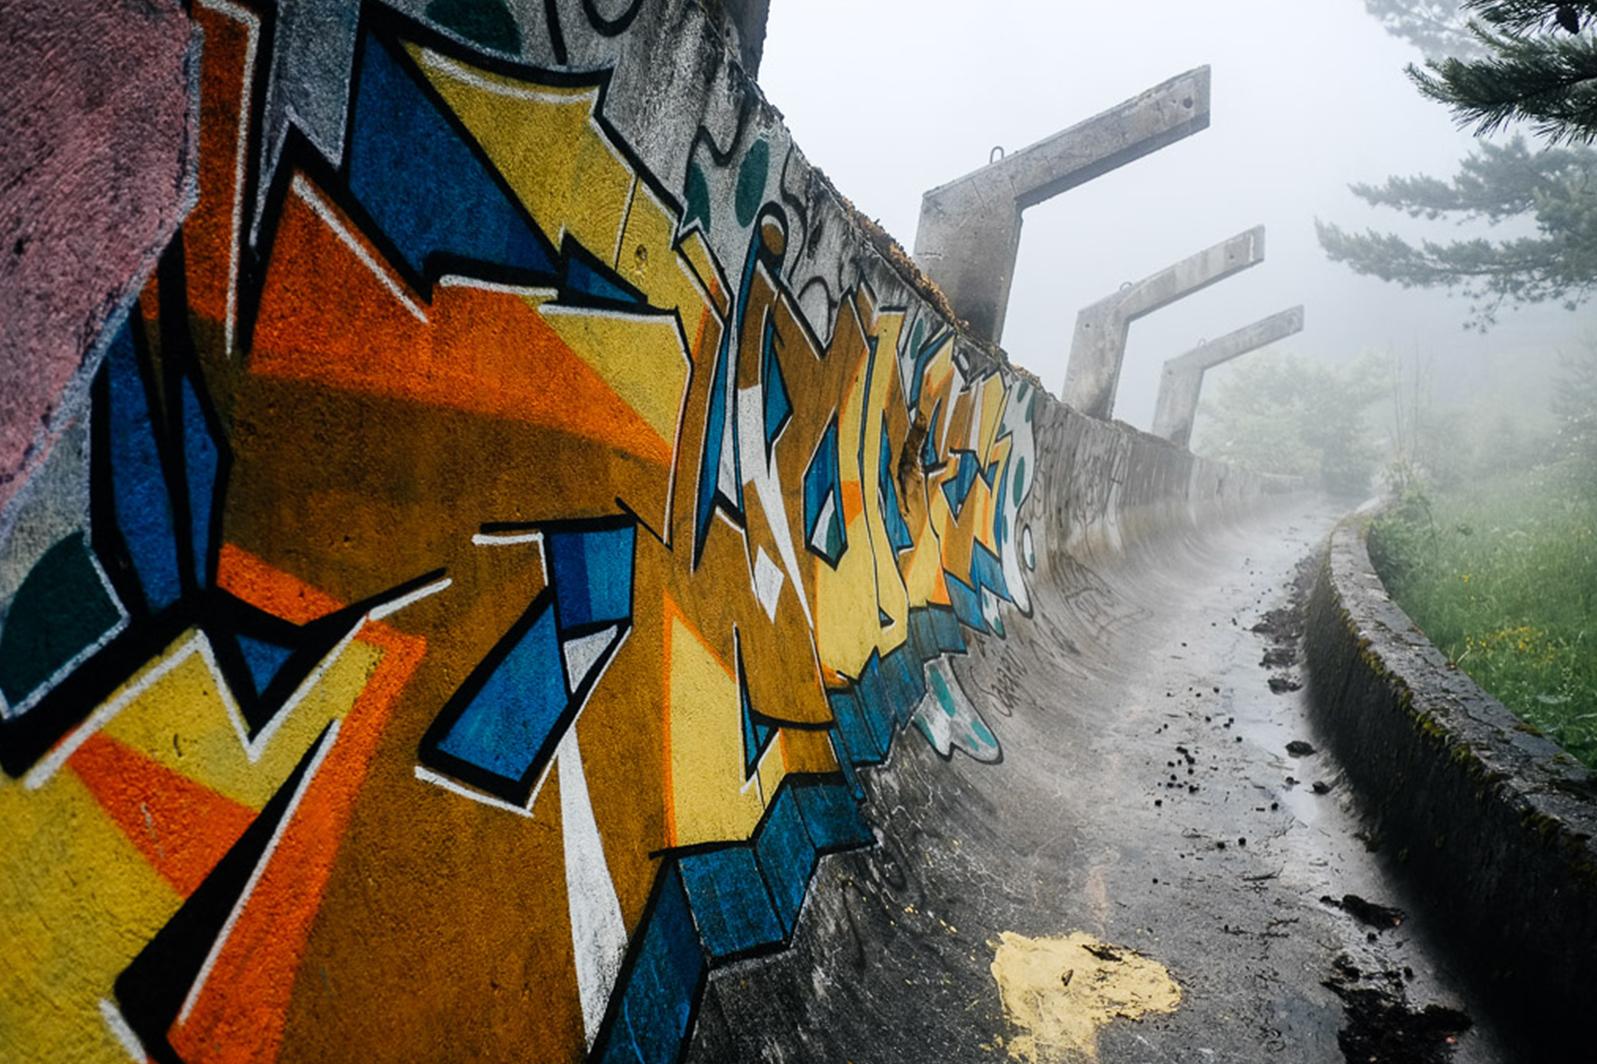 urbex bobsleigh piste jo sarajevo - Berlin, Sarajevo, Athènes : les sites des Jeux Olympiques version urbex